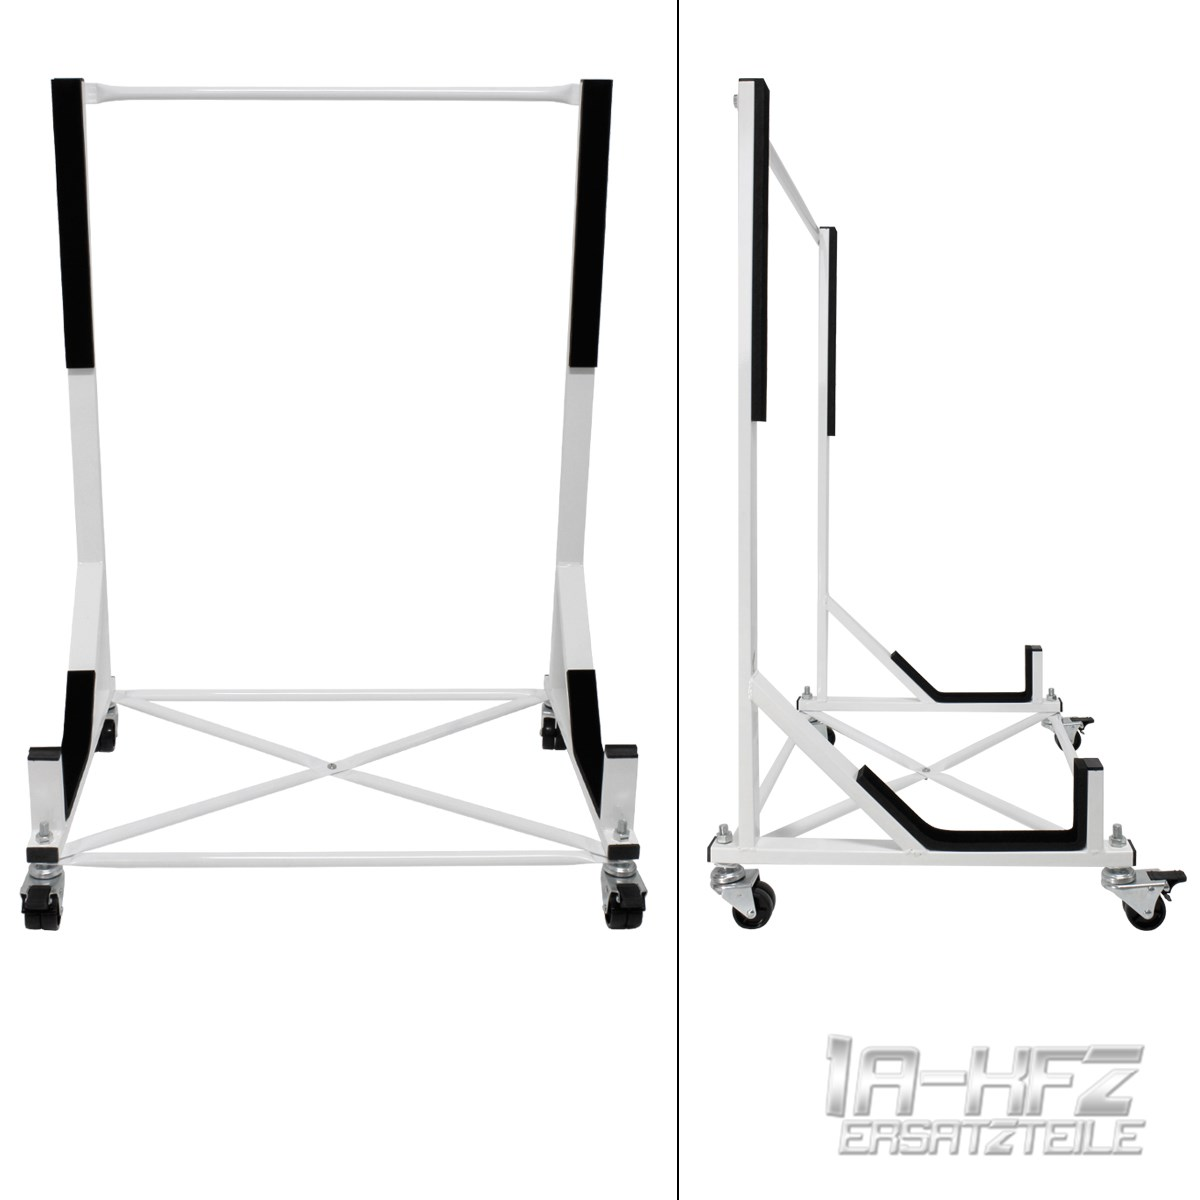 White Hardtop Stand Storage Cover 4 Wheels Triumph